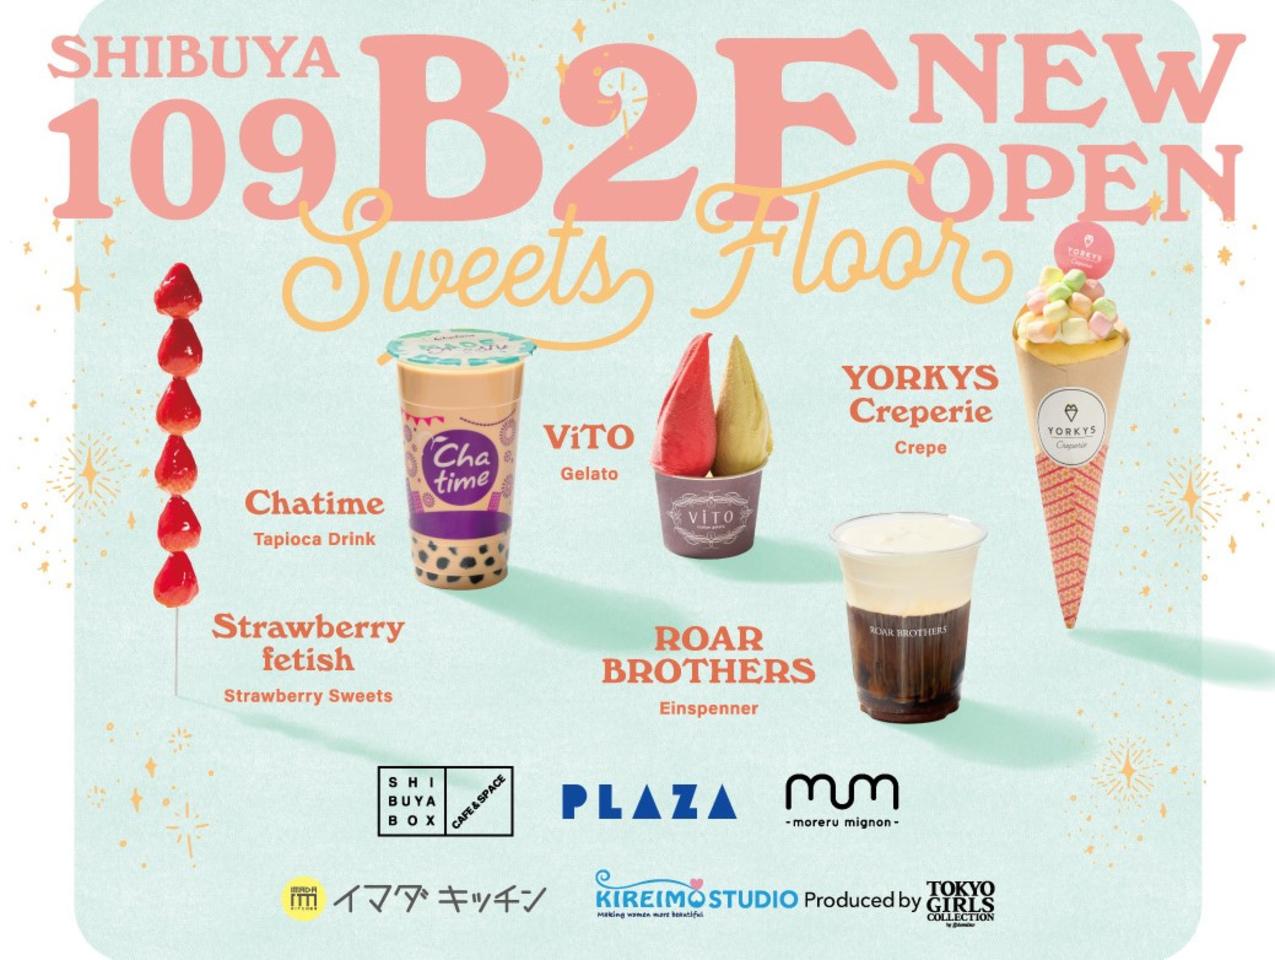 SHIBUYA109の地下2階に食のフロア「モグモグスタンド」6月28日オープン!